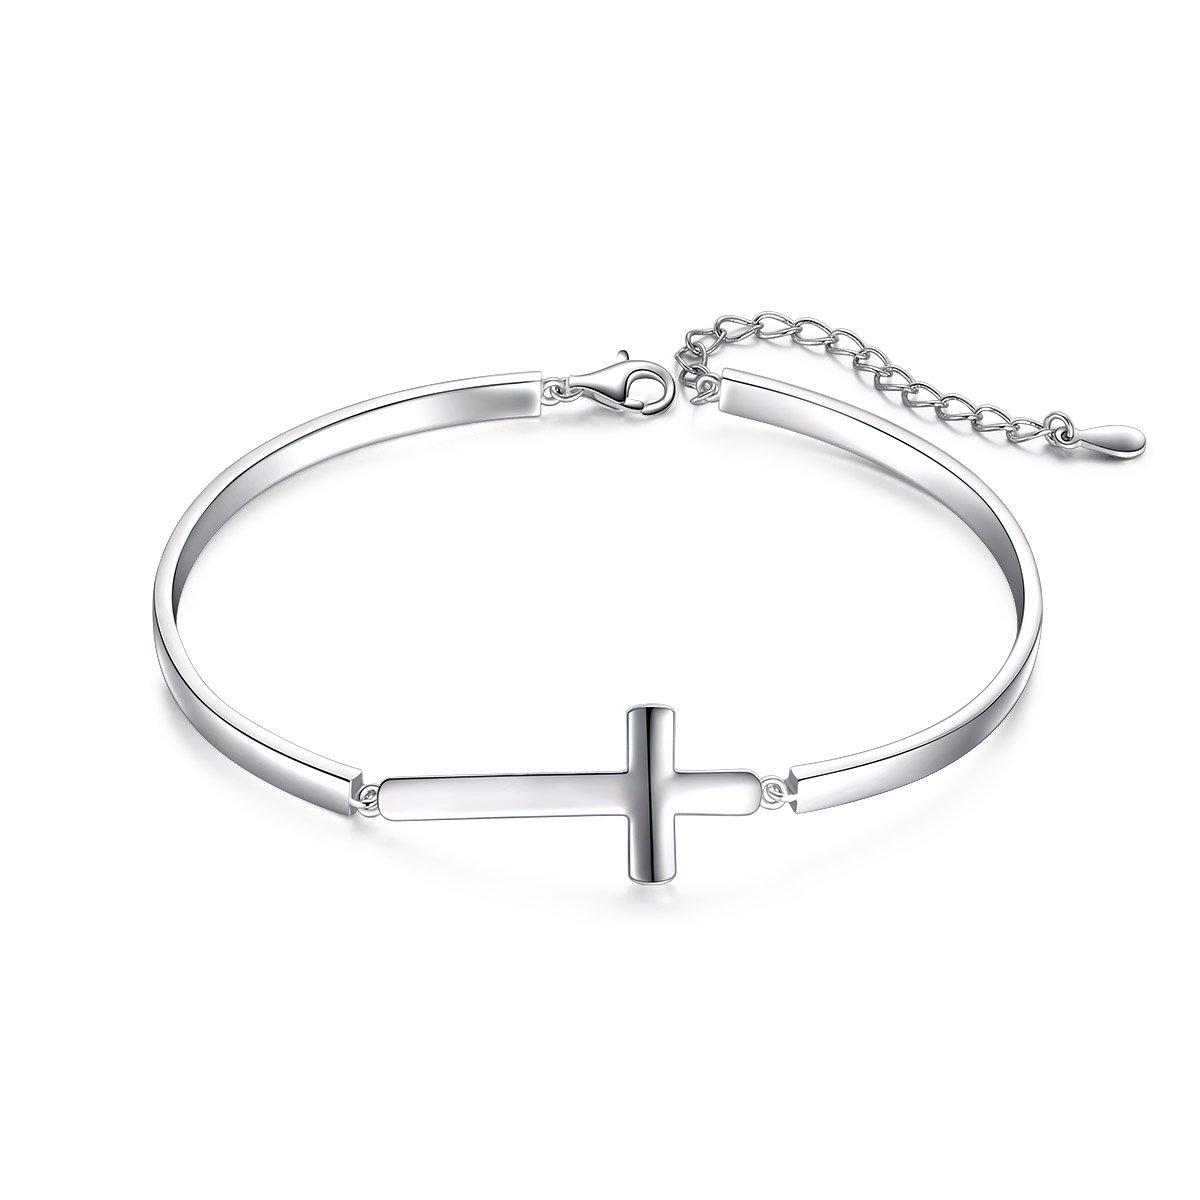 DAOCHONG S925 Sterling Silver Sideways Cross Adjustable Cuff Bangle Bracelets for Women Mother Gift